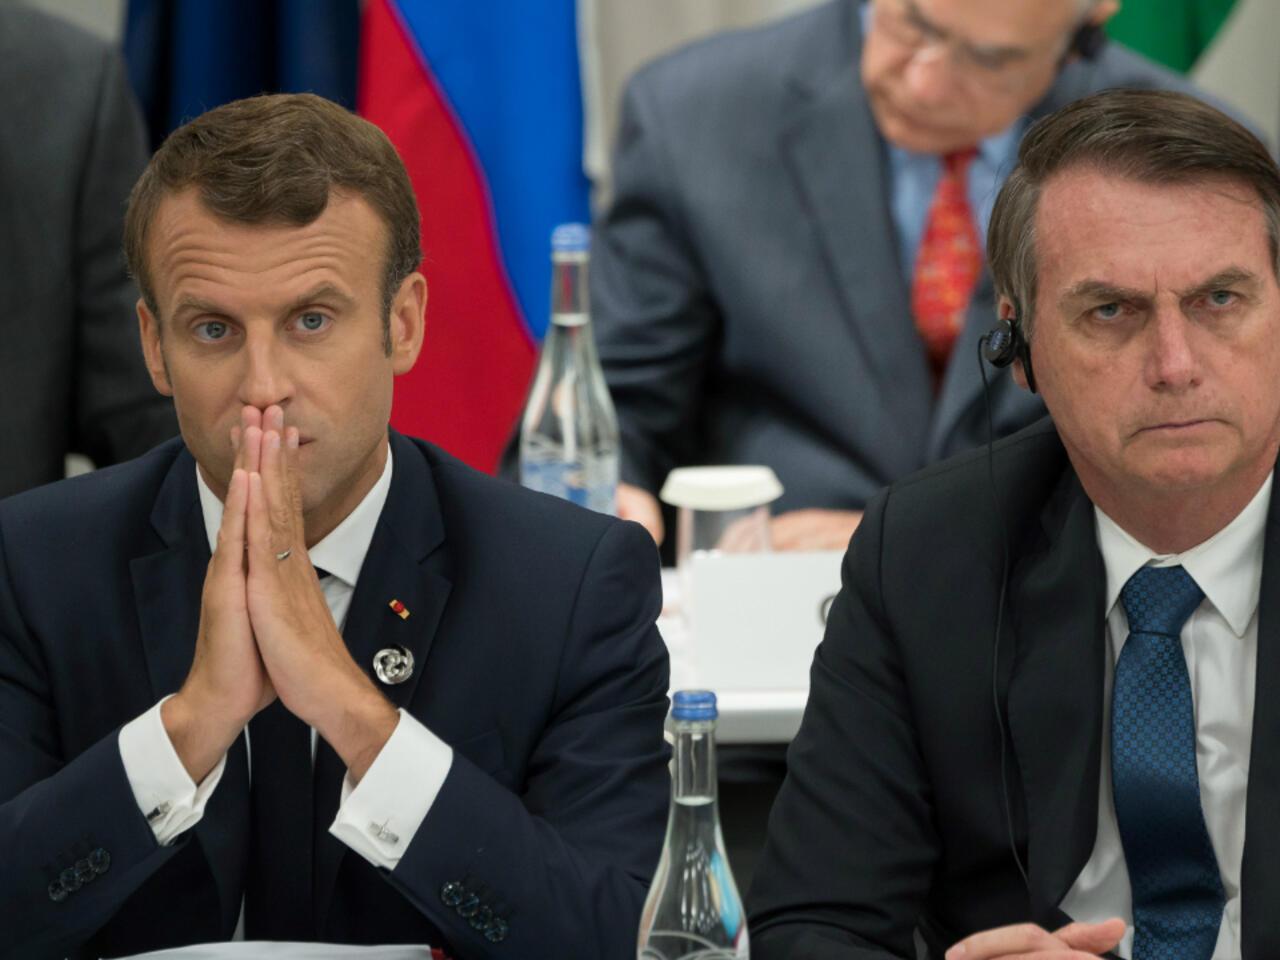 Macron Calls Out Bolsonaro S Extraordinarily Rude Insults Against Wife Brigitte